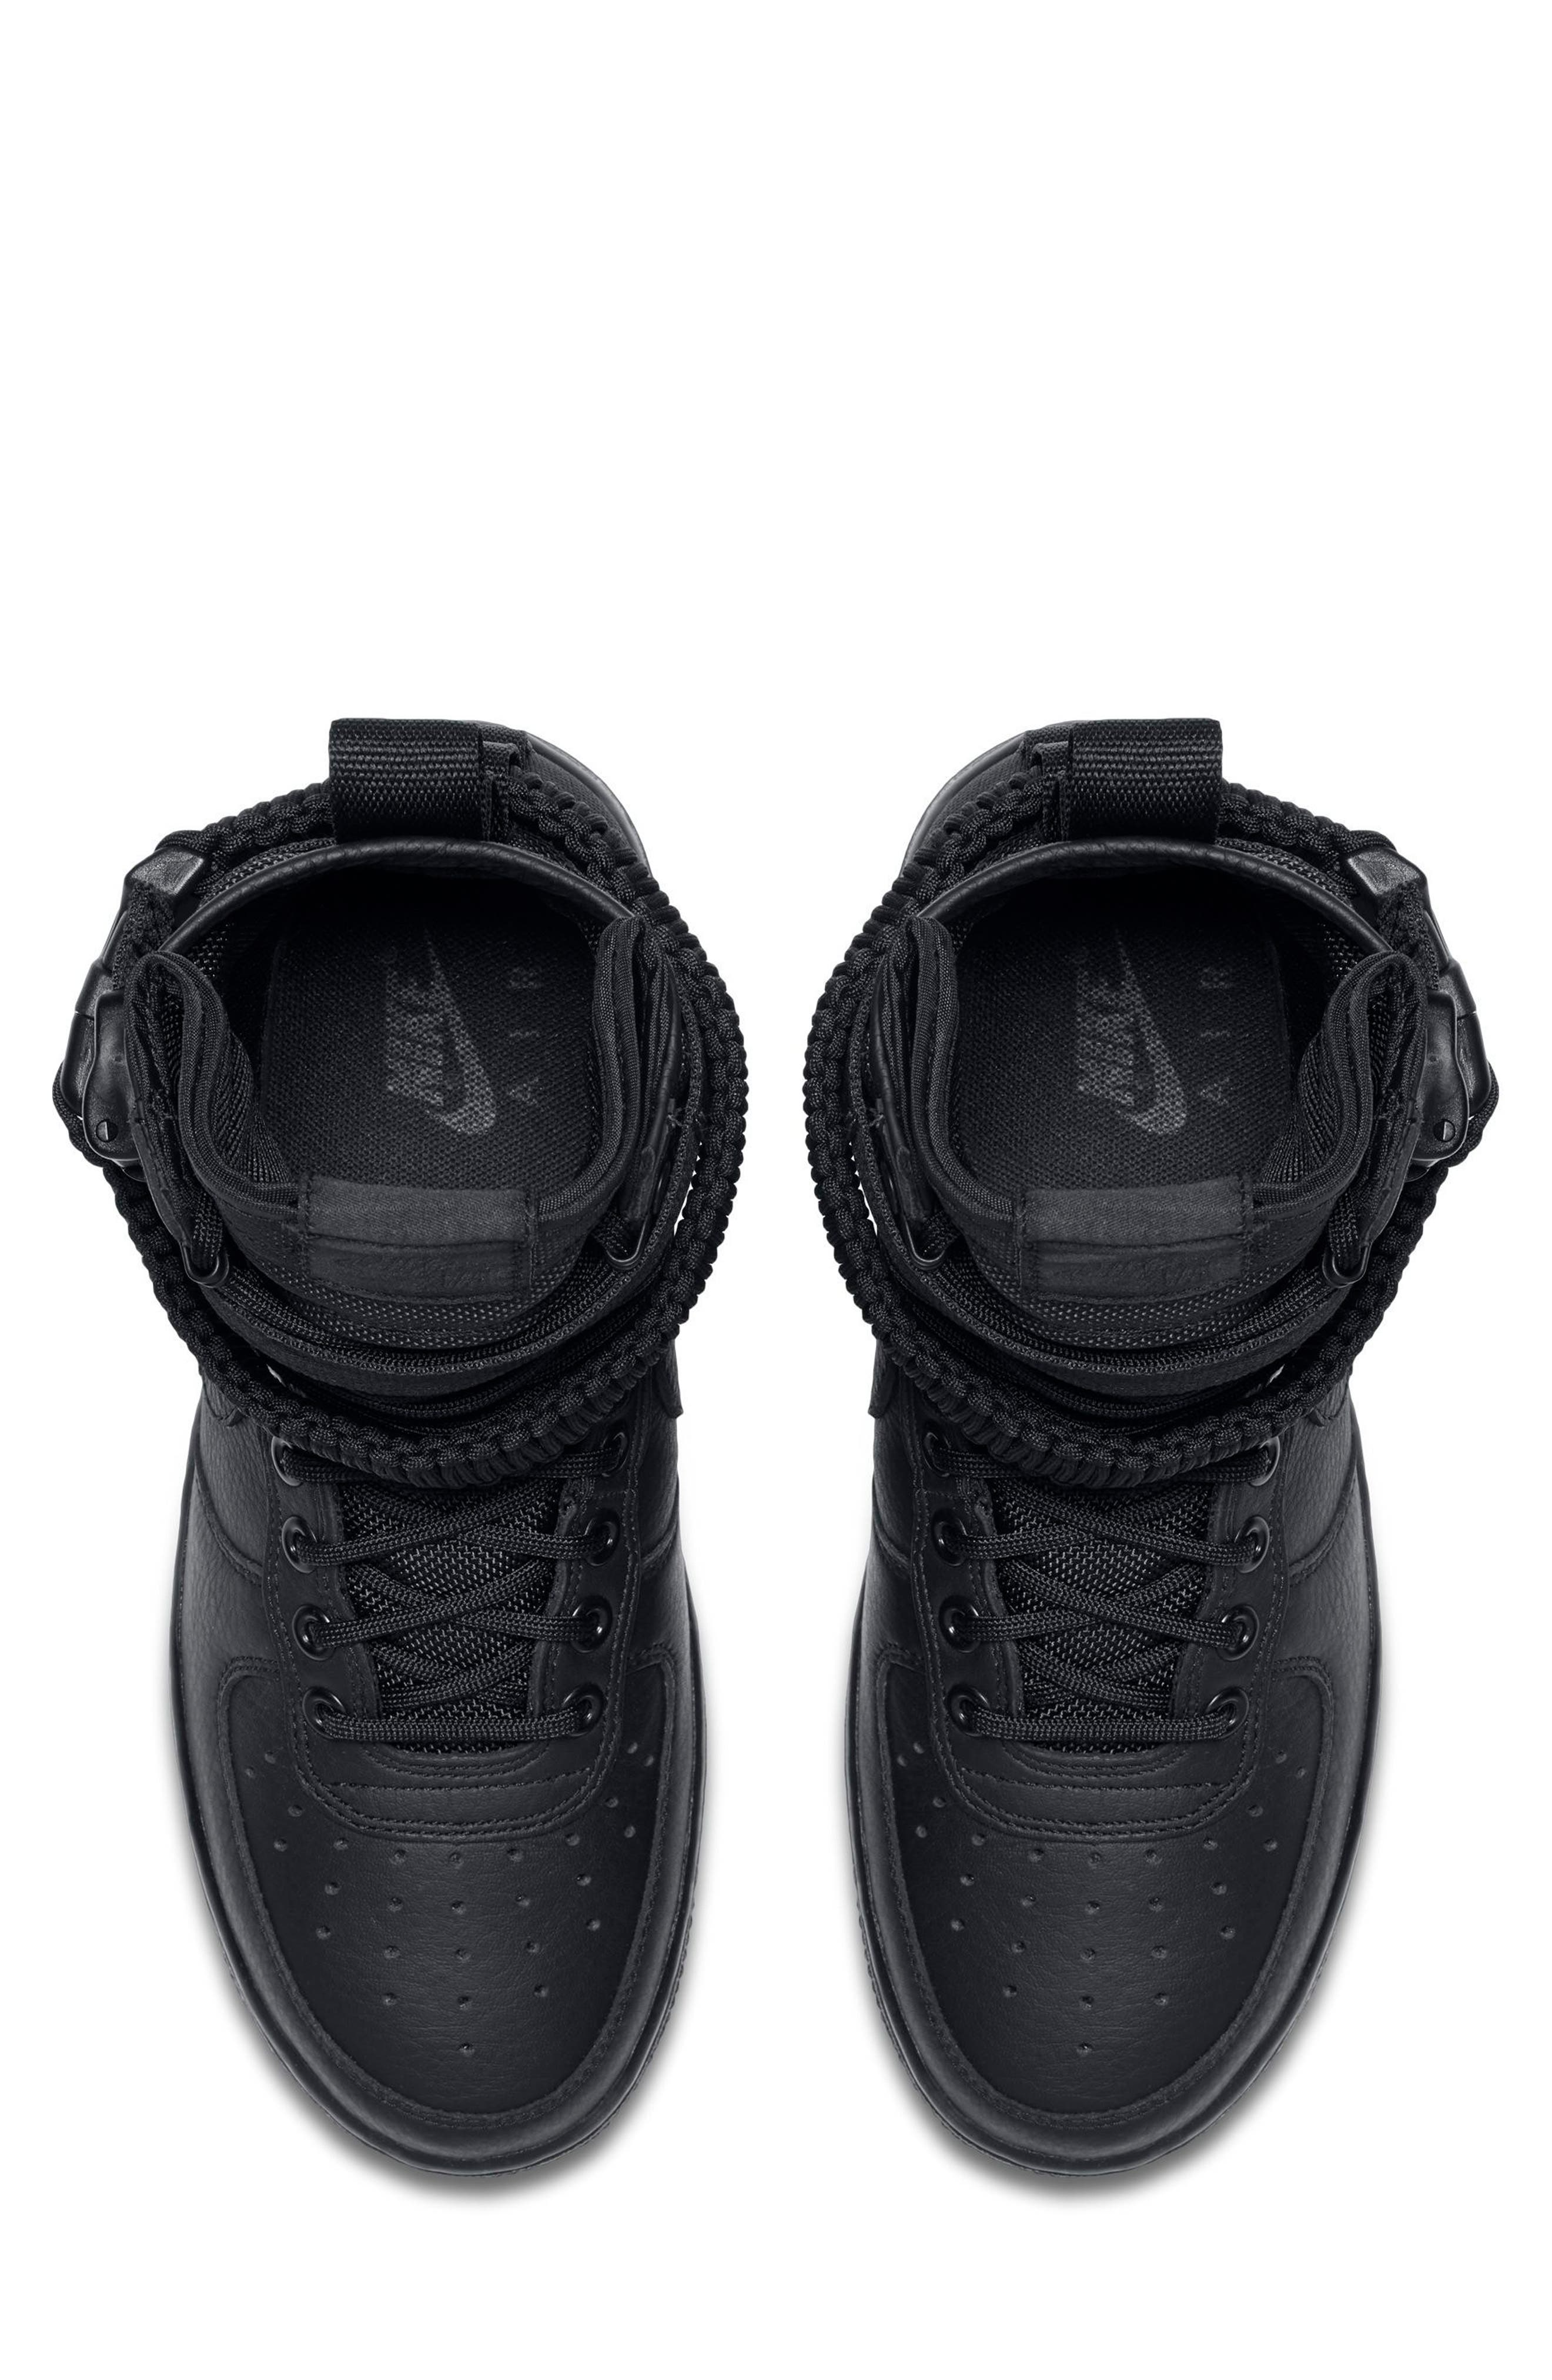 SF Air Force 1 High Top Sneaker,                             Alternate thumbnail 4, color,                             002